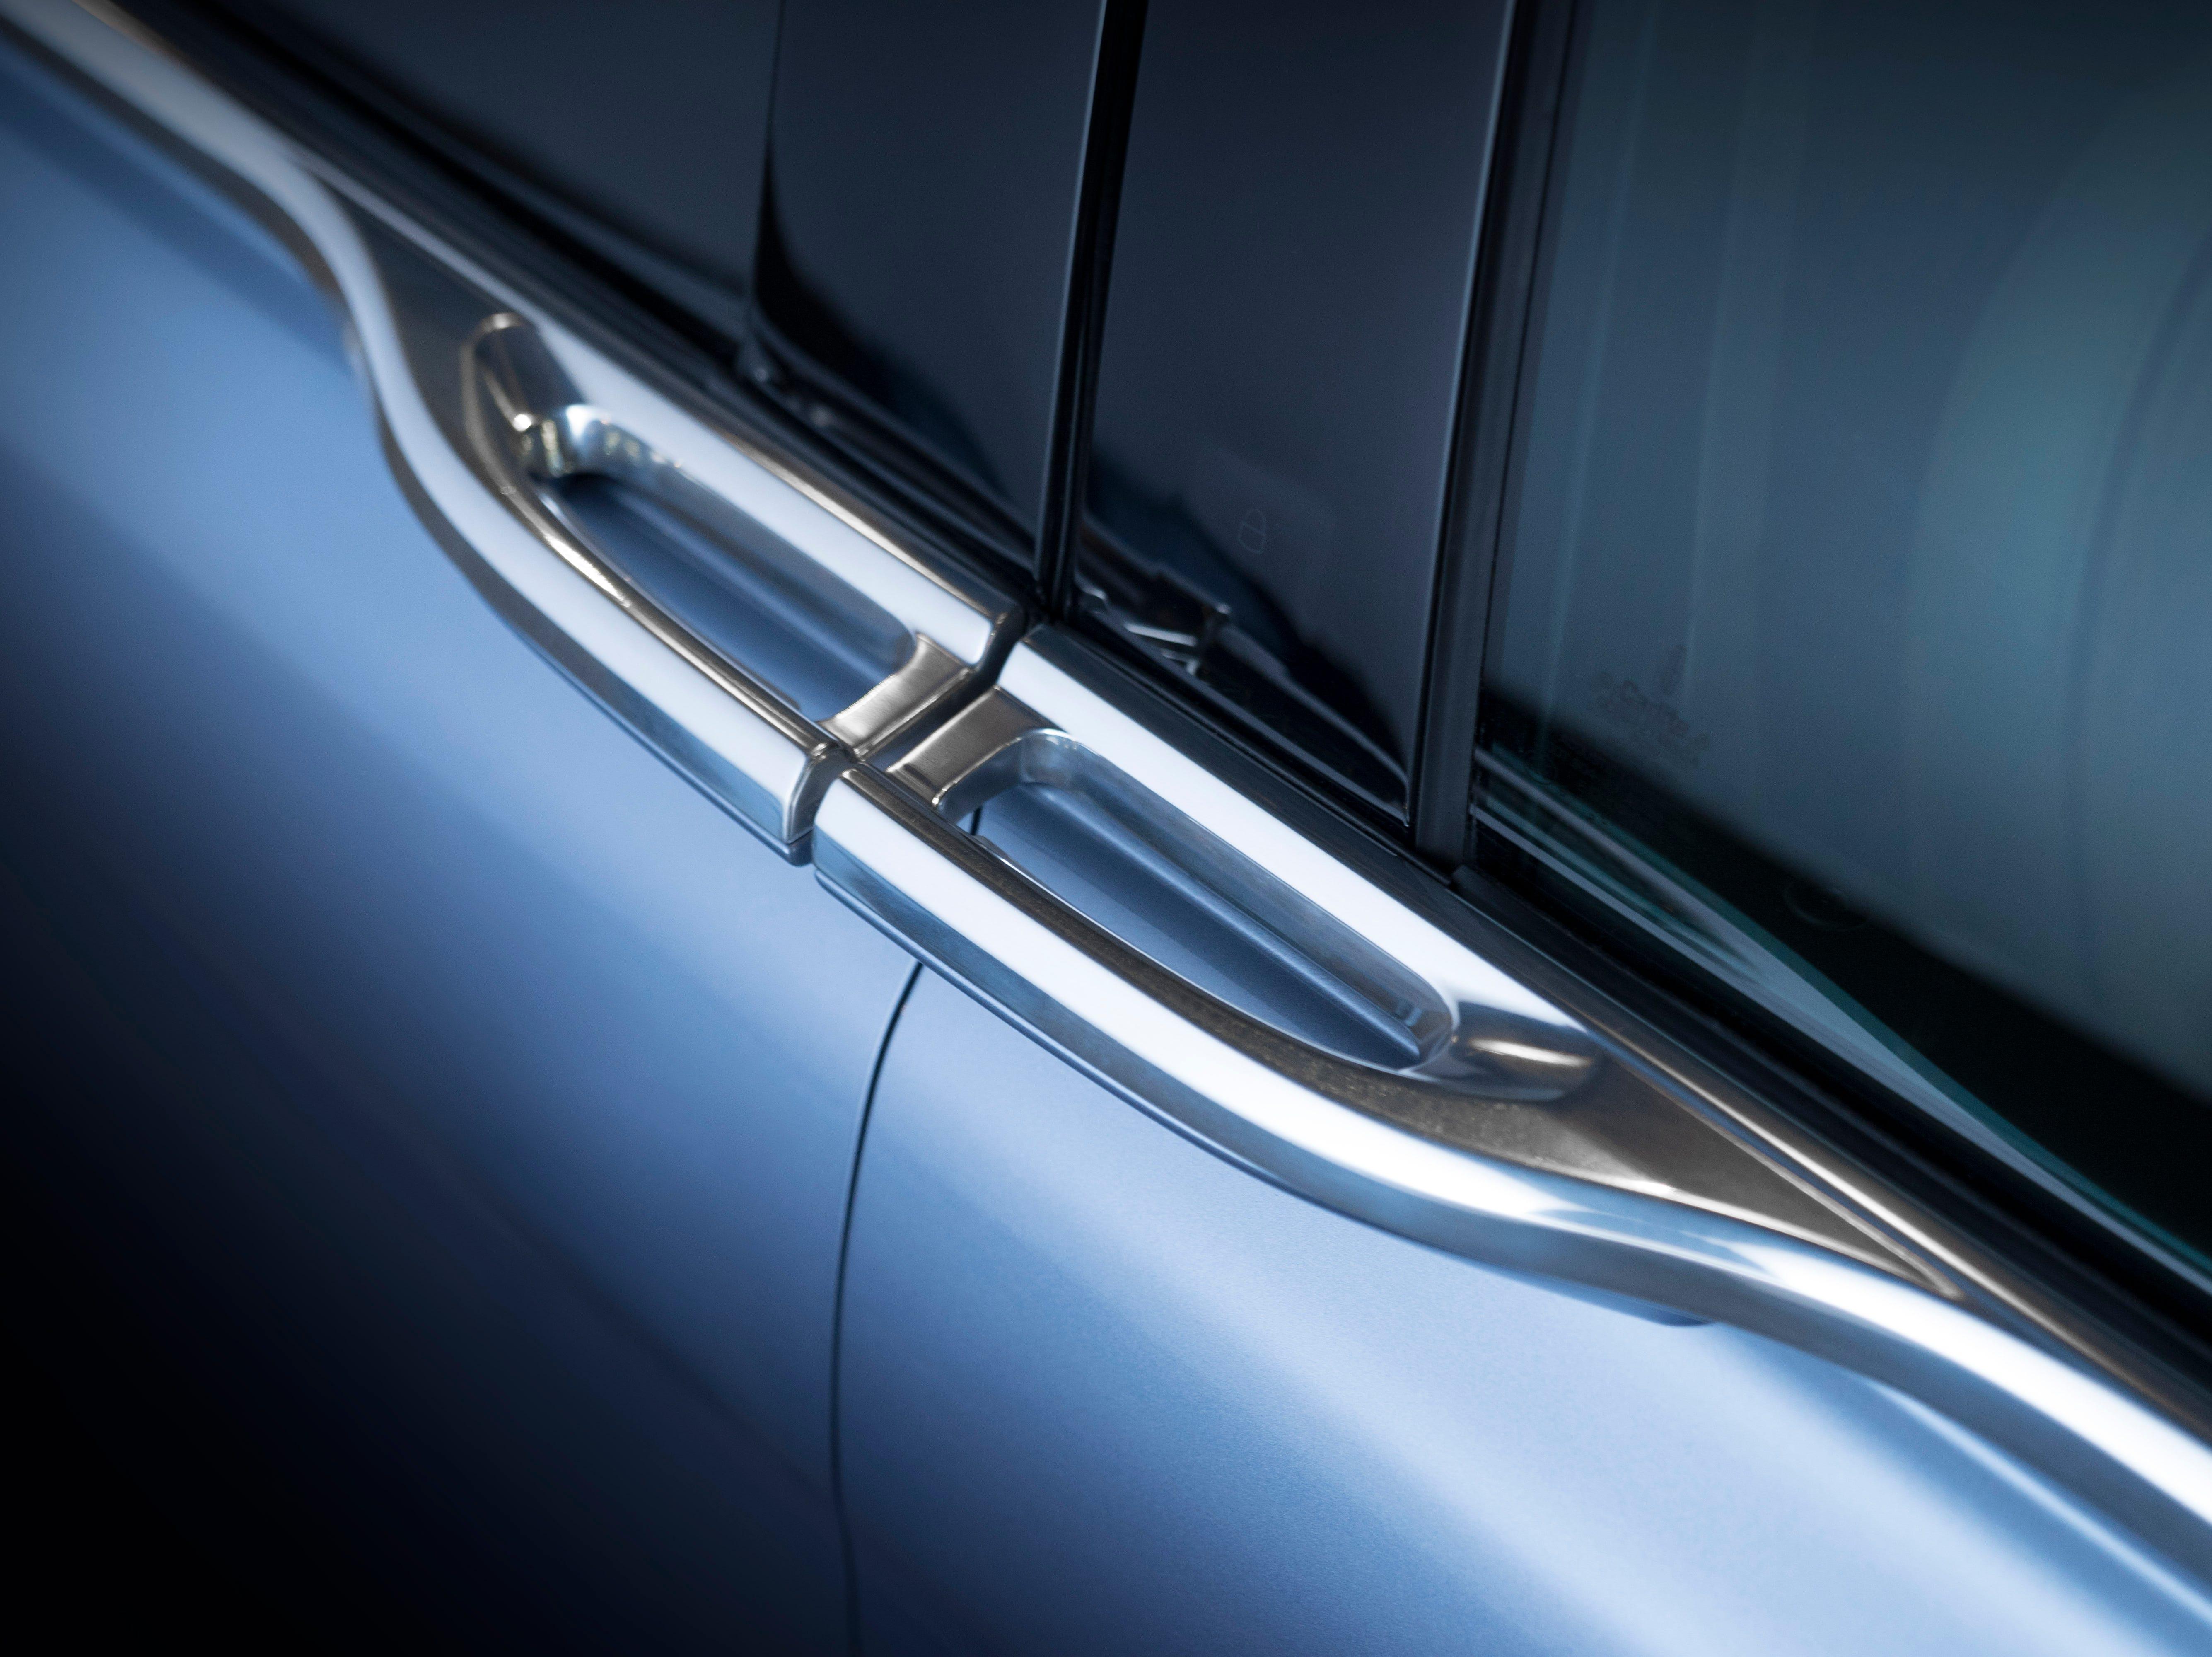 80th Anniversary Lincoln Continental Coach Door Edition.